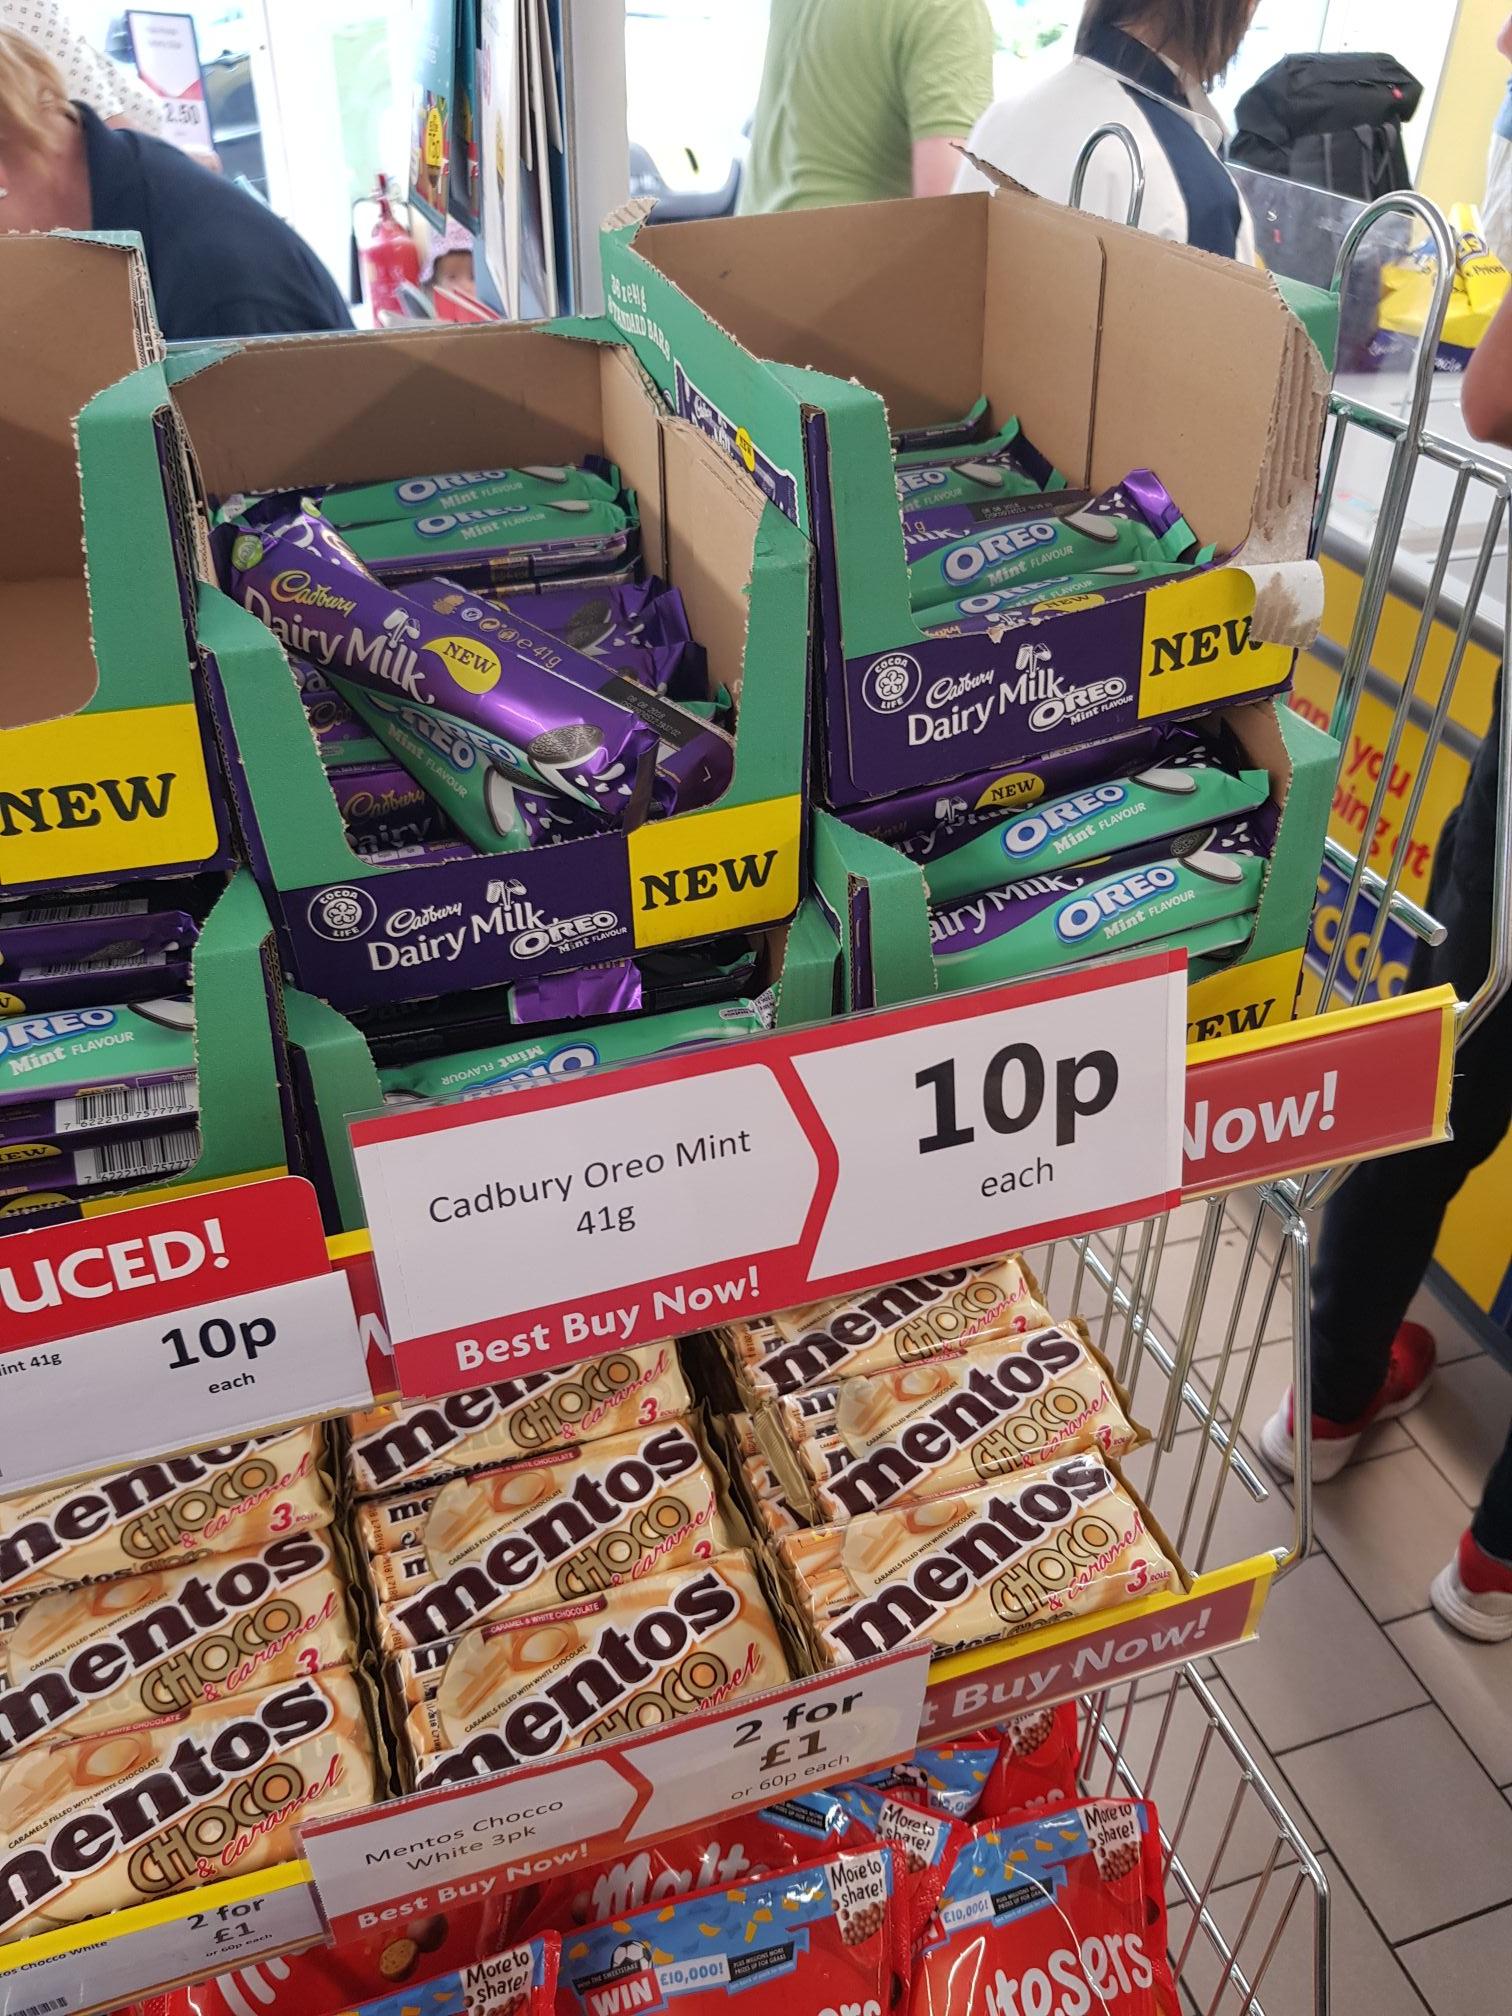 Cadbury Oreo Mint 41g - 10p Herons